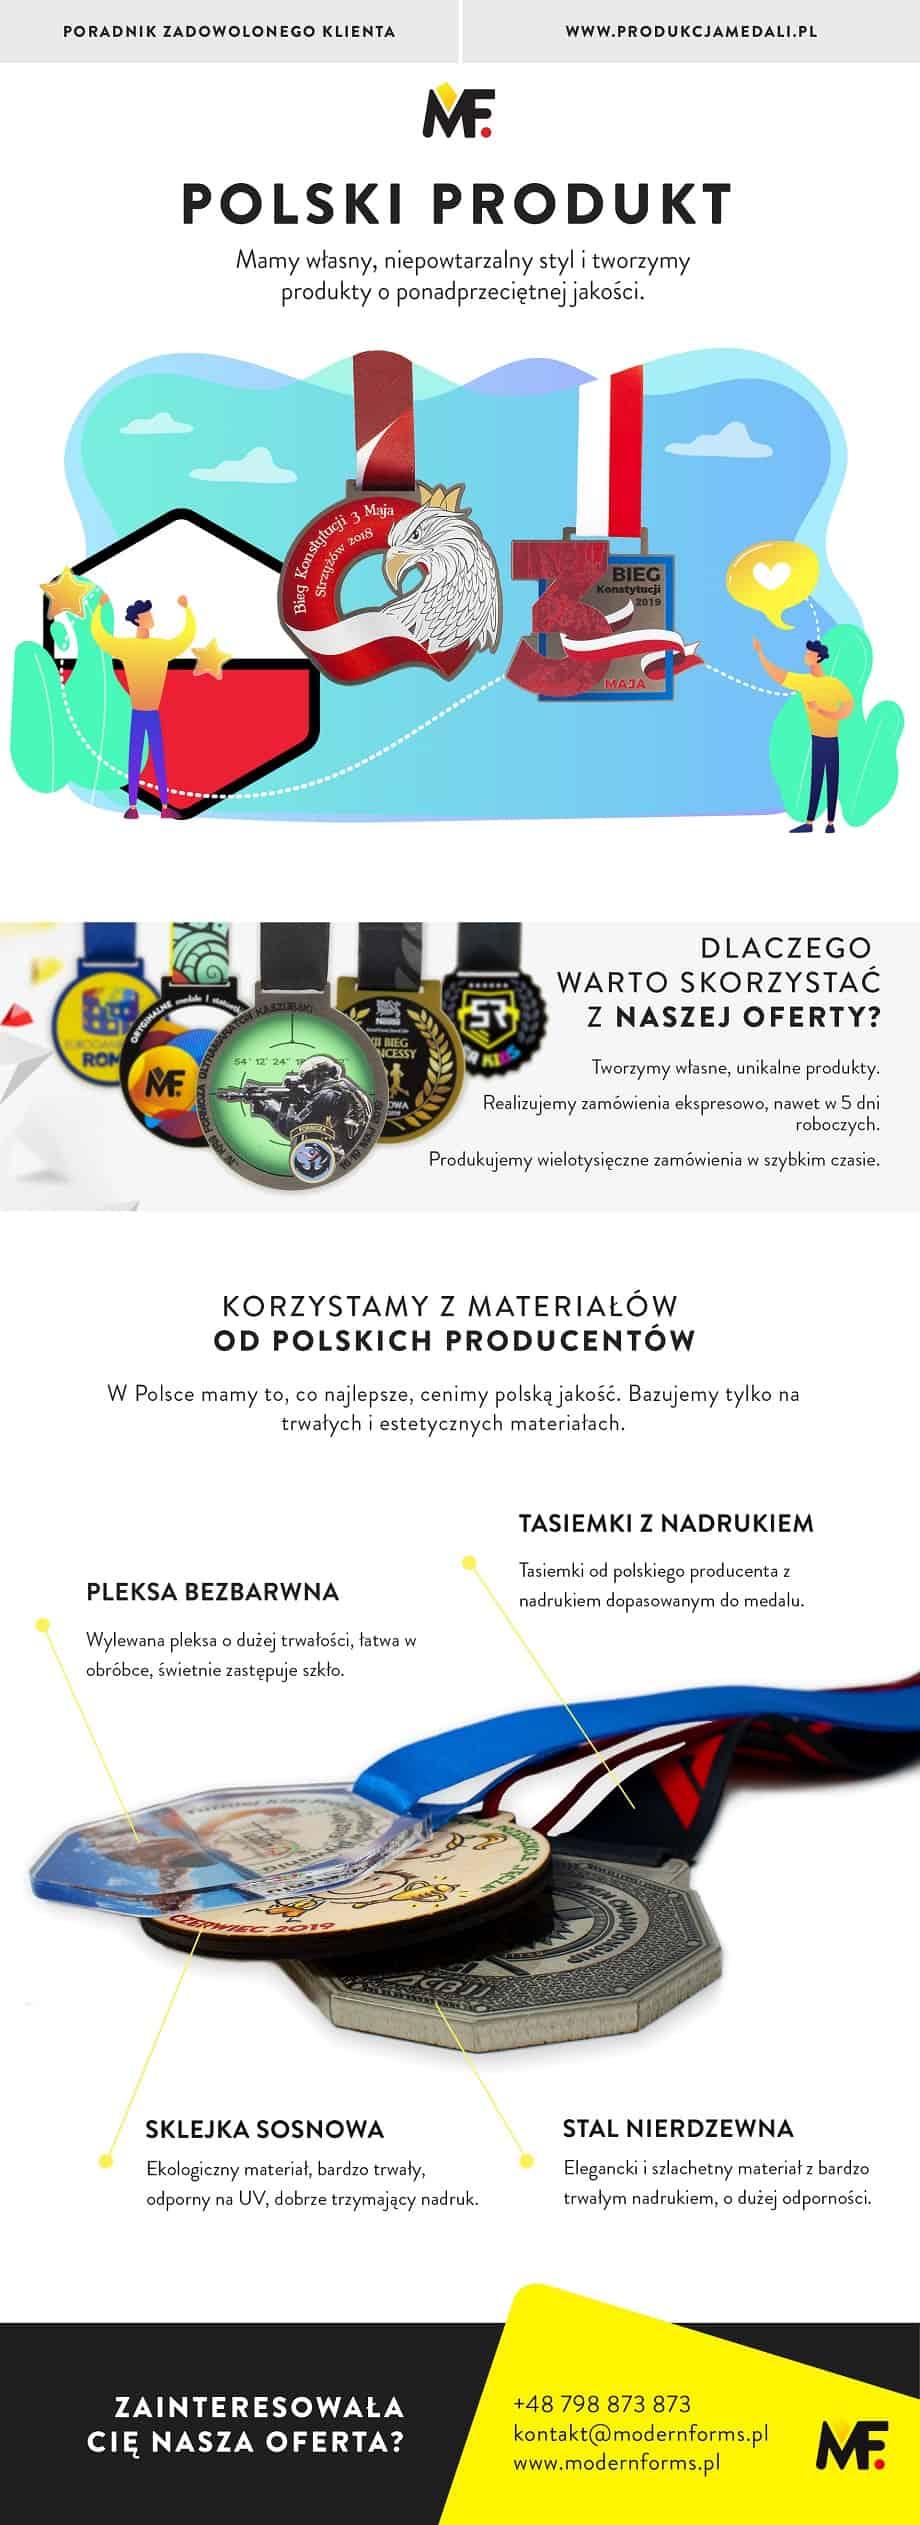 Medale polskiej produkcji infografika